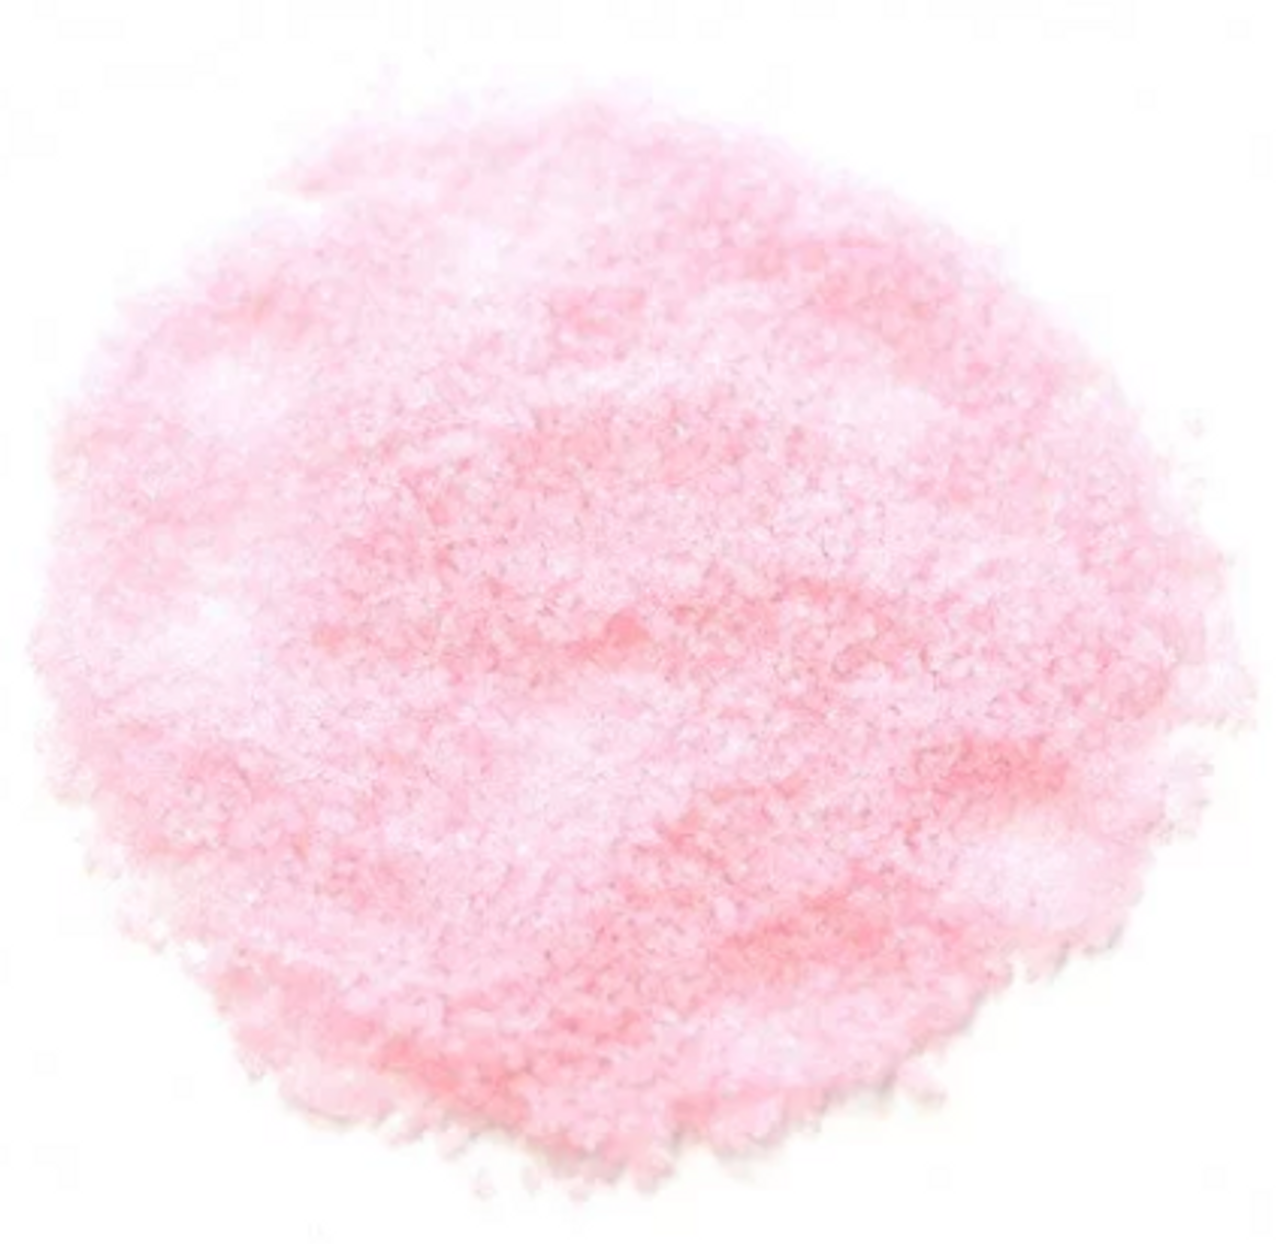 Prague Powder No 1 Pink Curing Salt